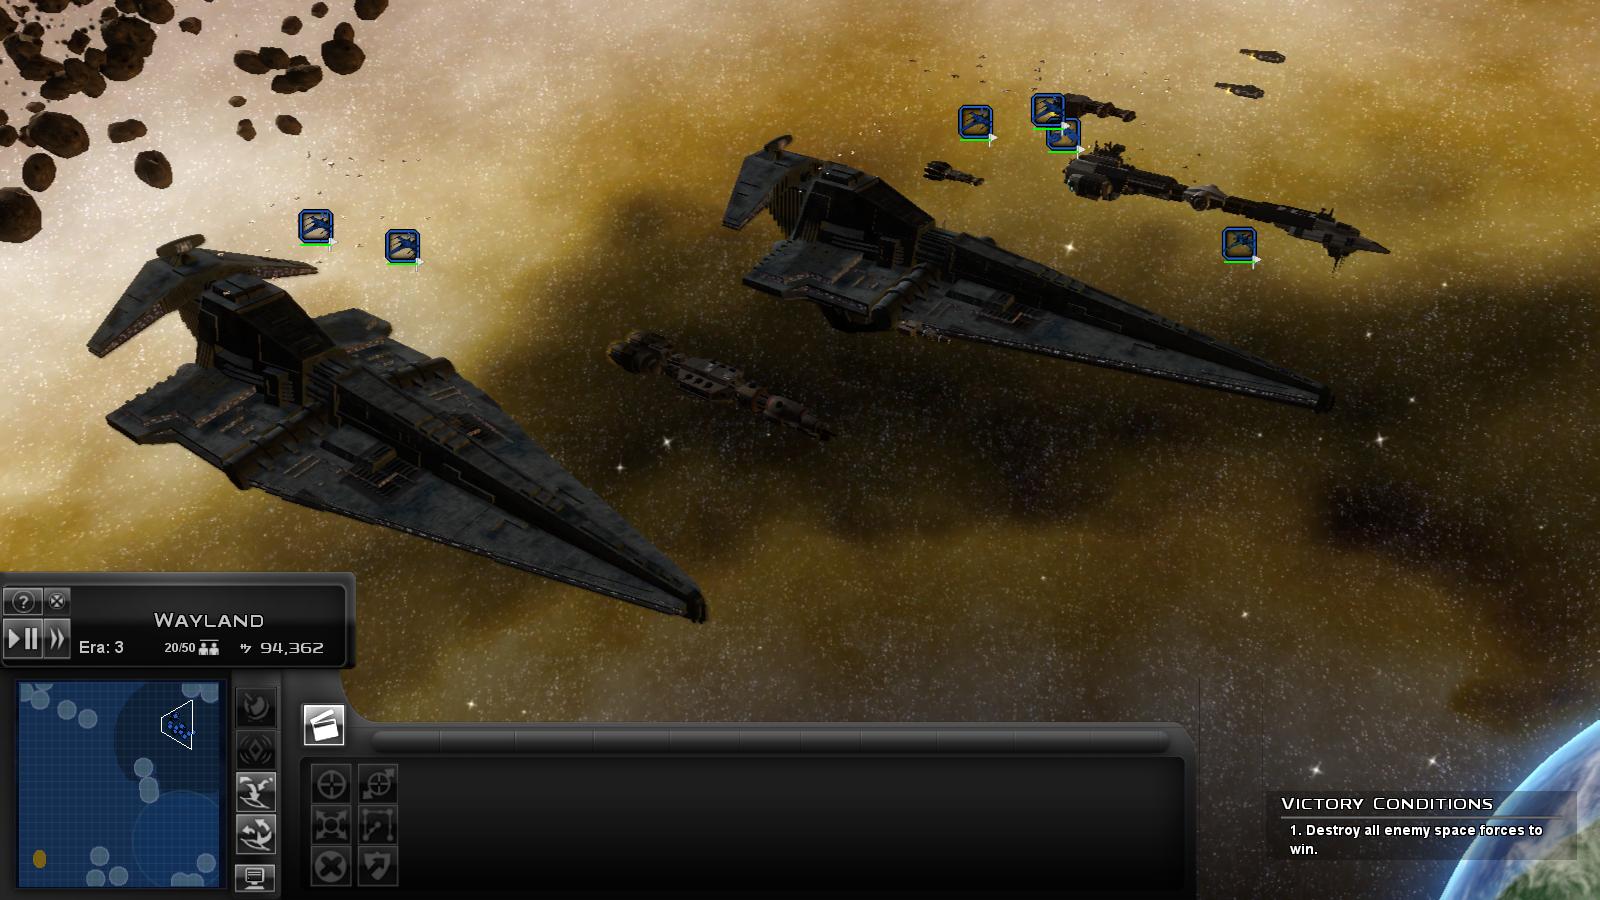 Corellian fleet